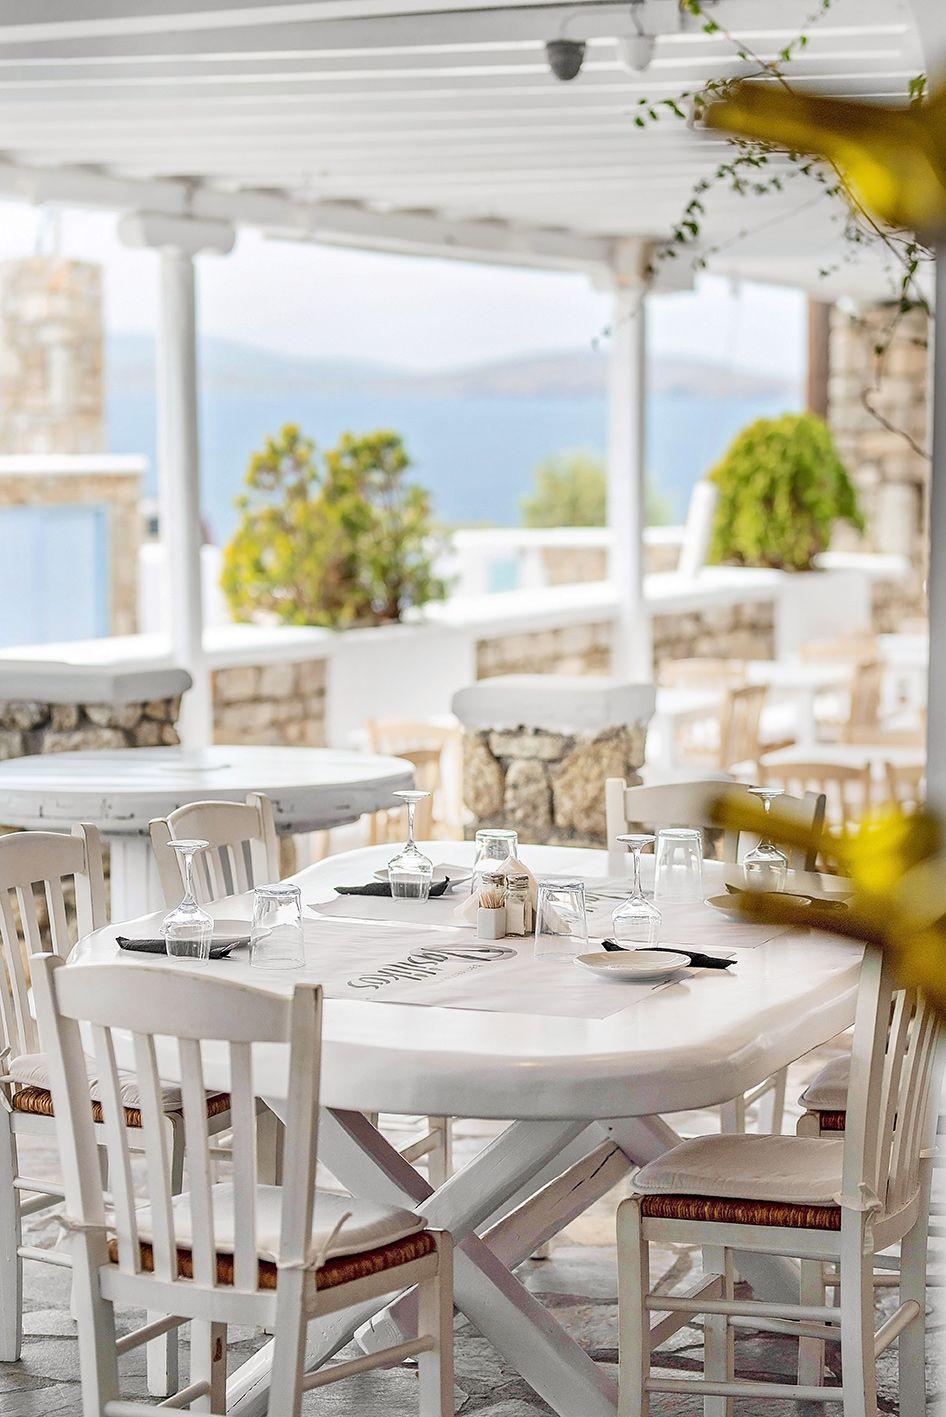 vasilikos-mykonos-restaurant-gallery-interior-15